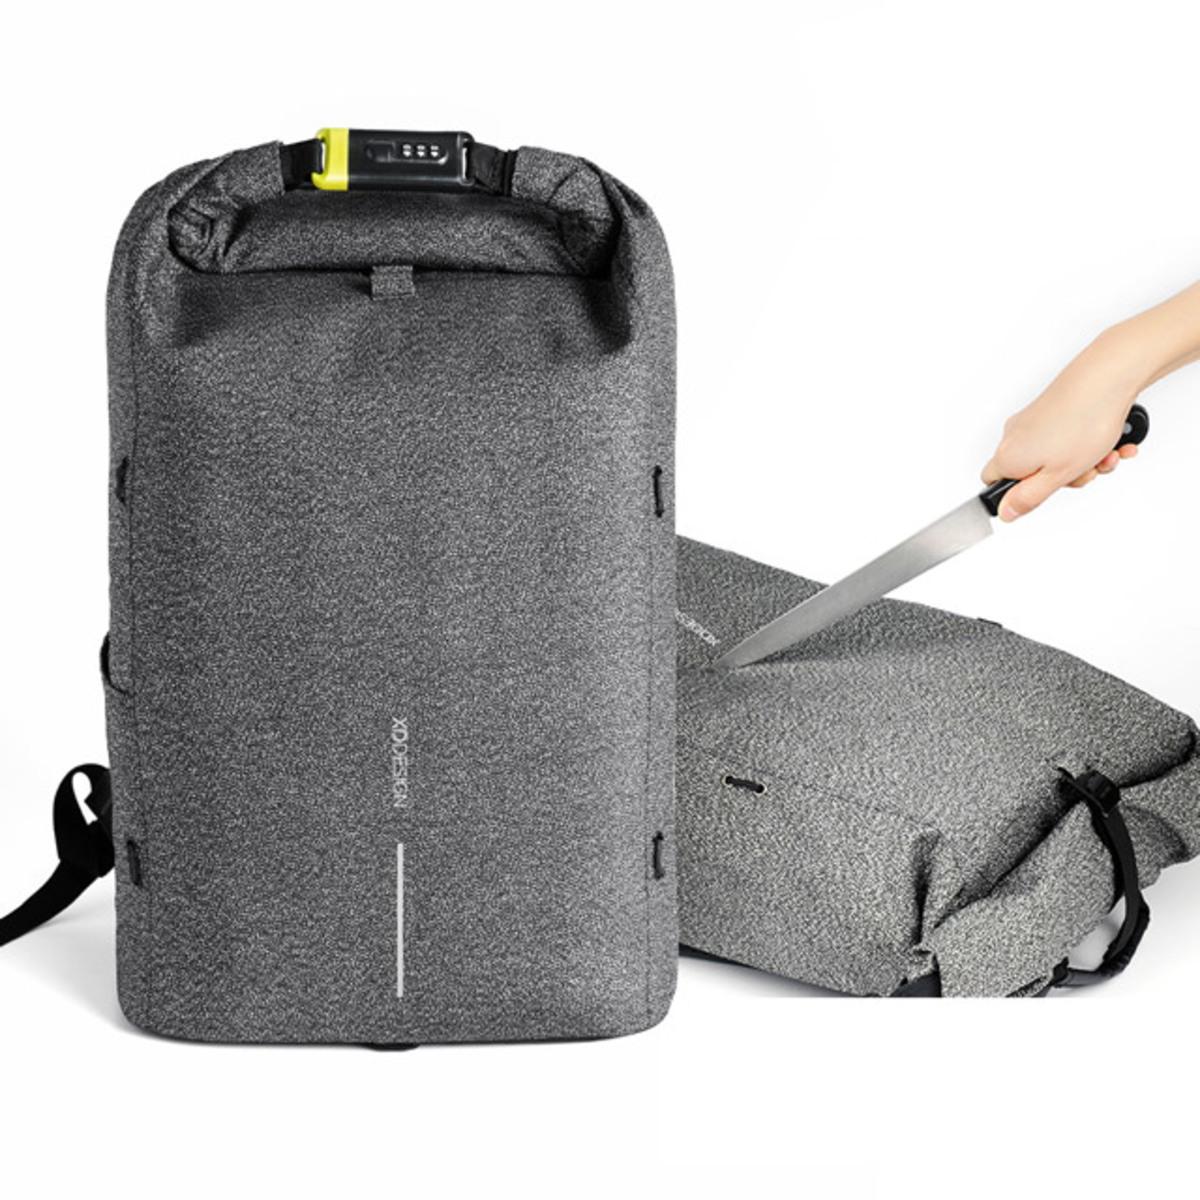 Bobby Urban Cut Proof Anti-Theft backpack - Grey